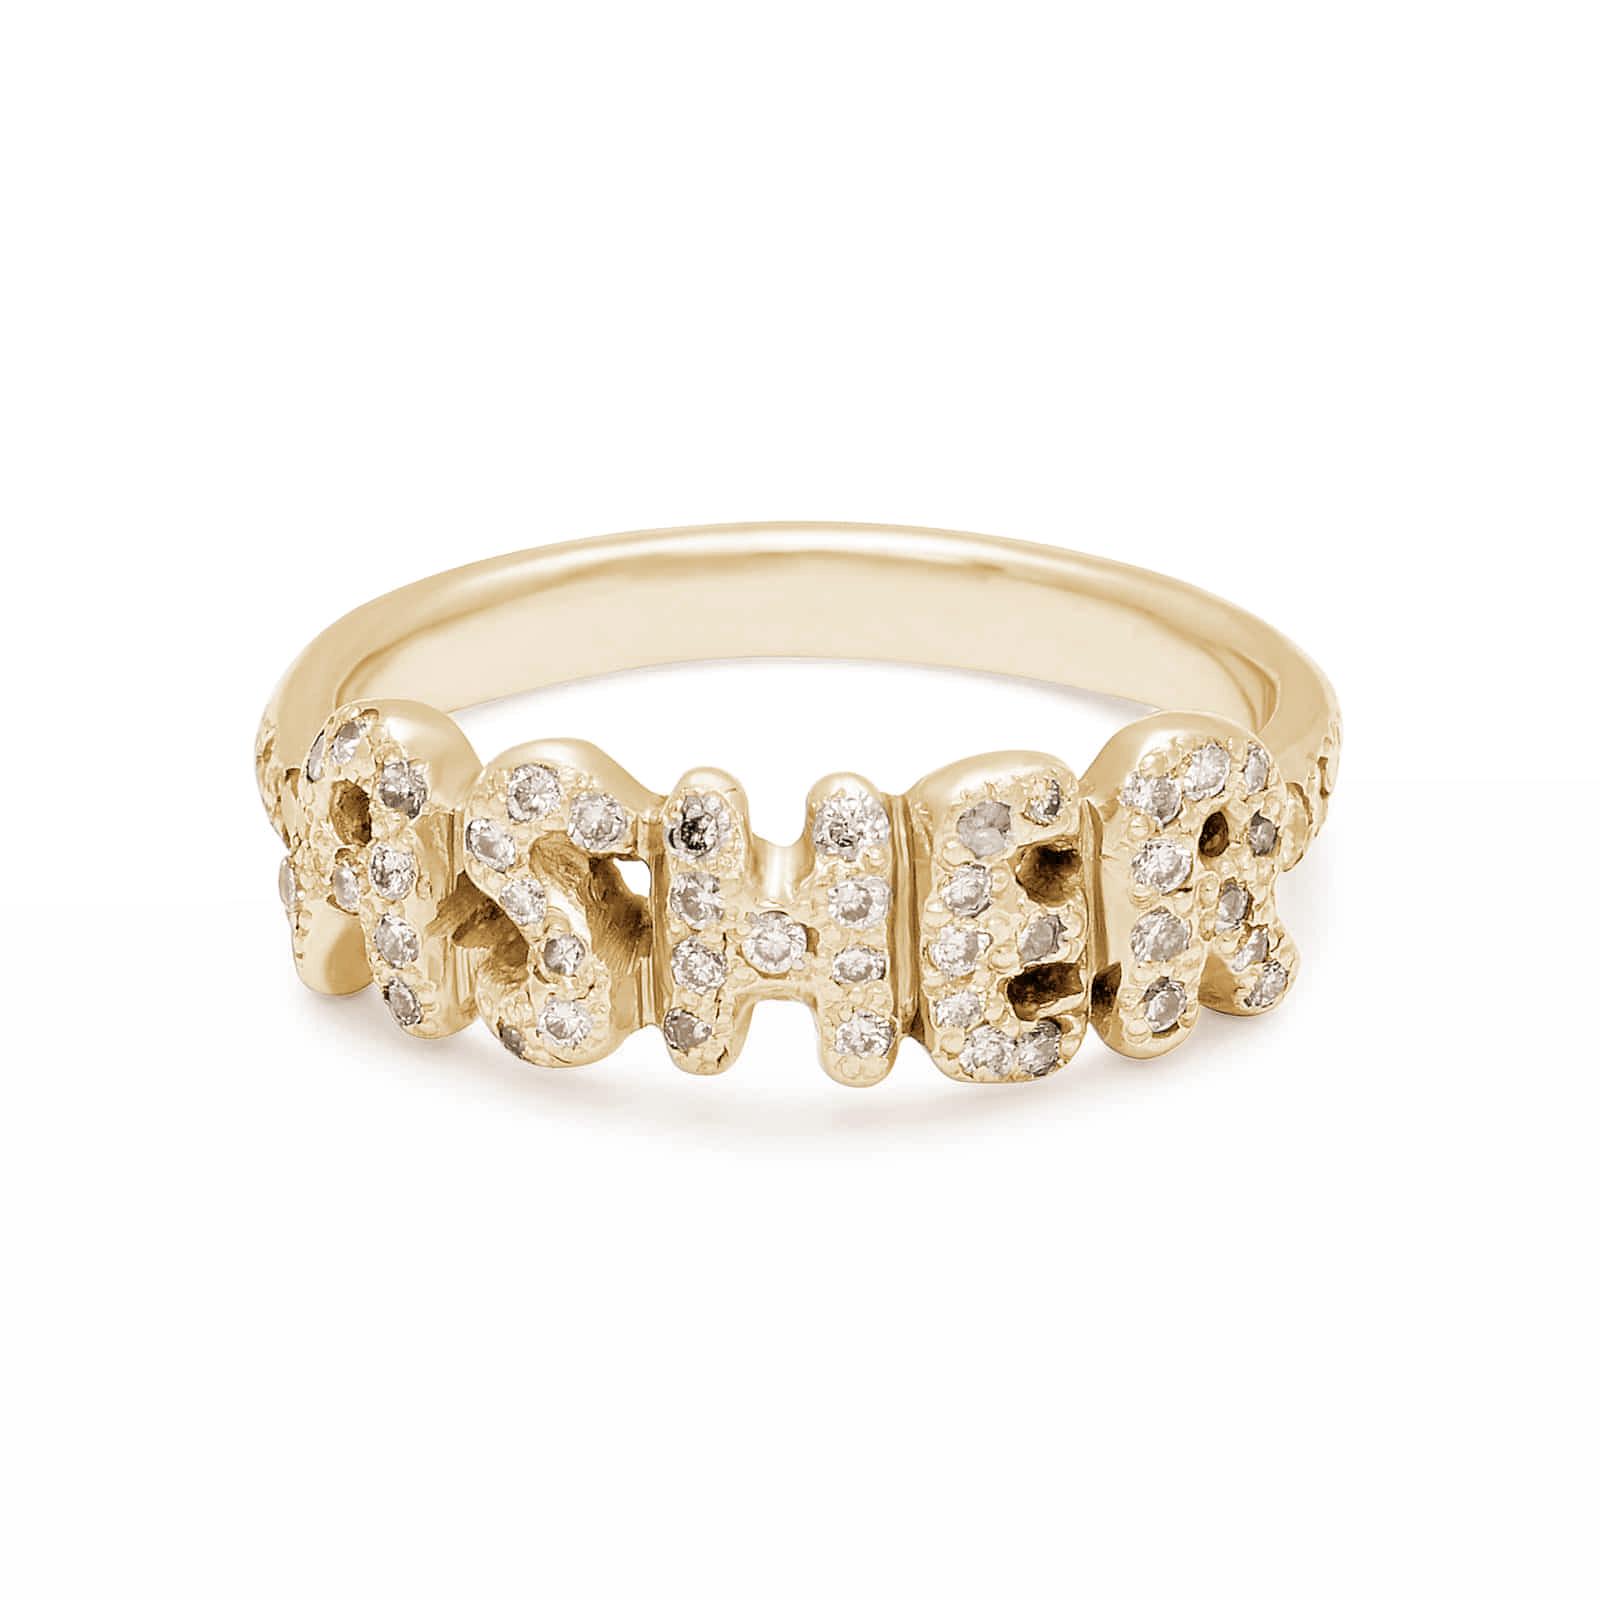 18k Yellow Gold White Diamond Encrusted Name Ring